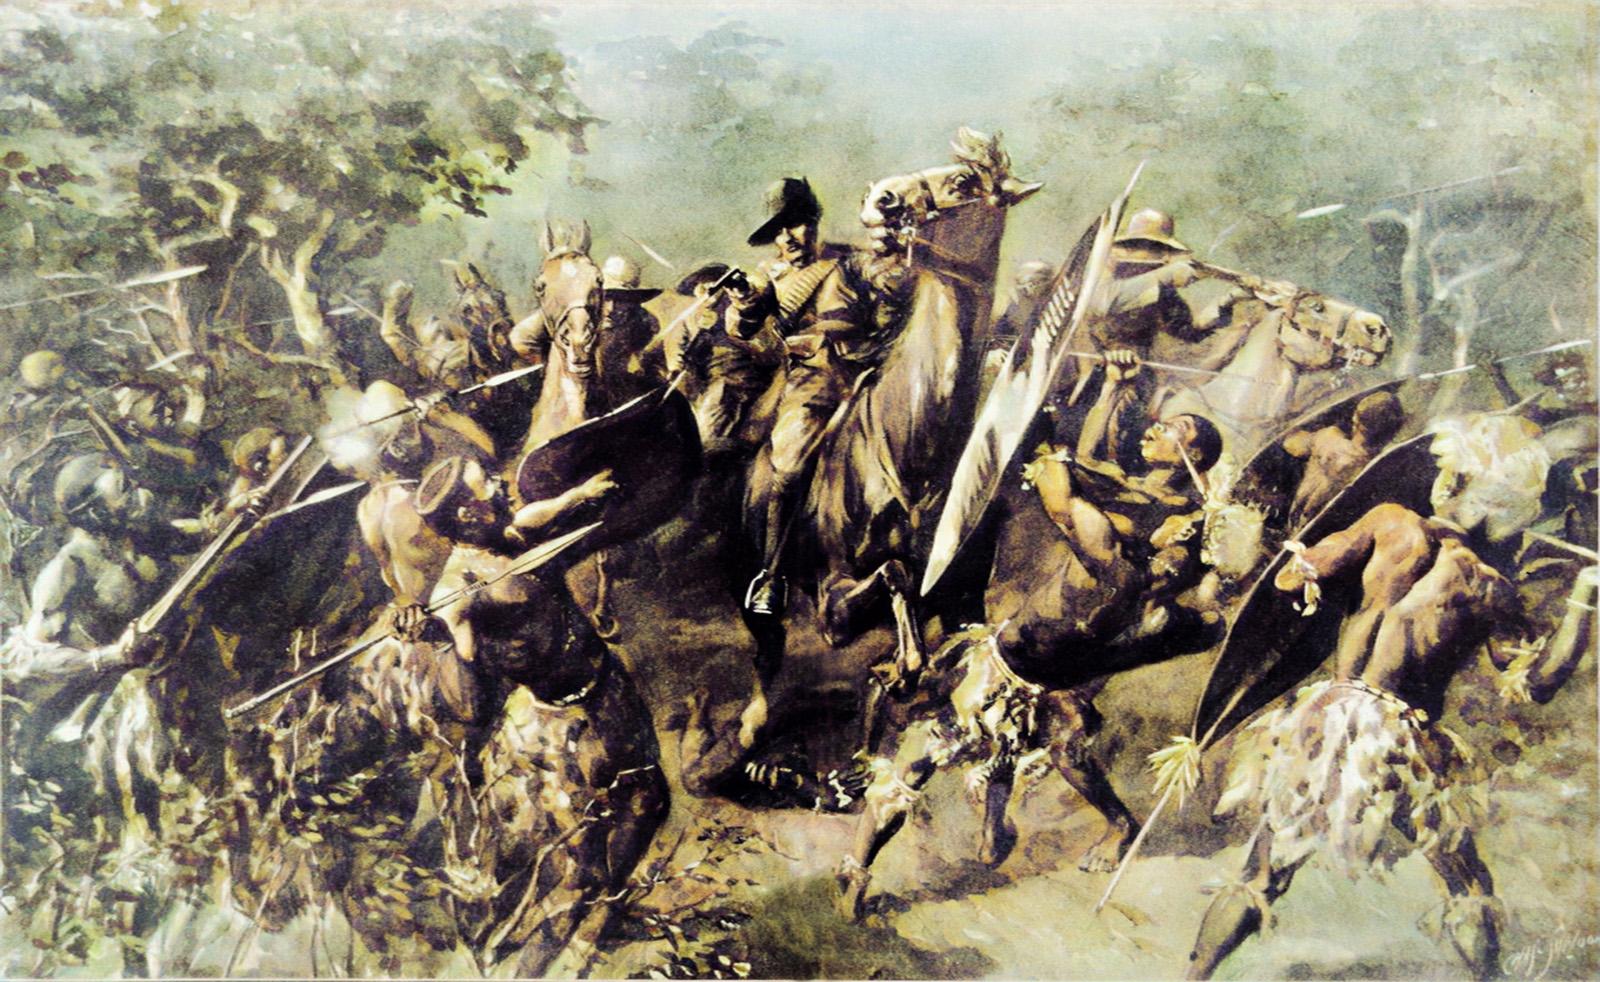 The outbreak of the rebellion - Bambatha's warriors ambush a police patrol at Mpanza on 4 April 1906